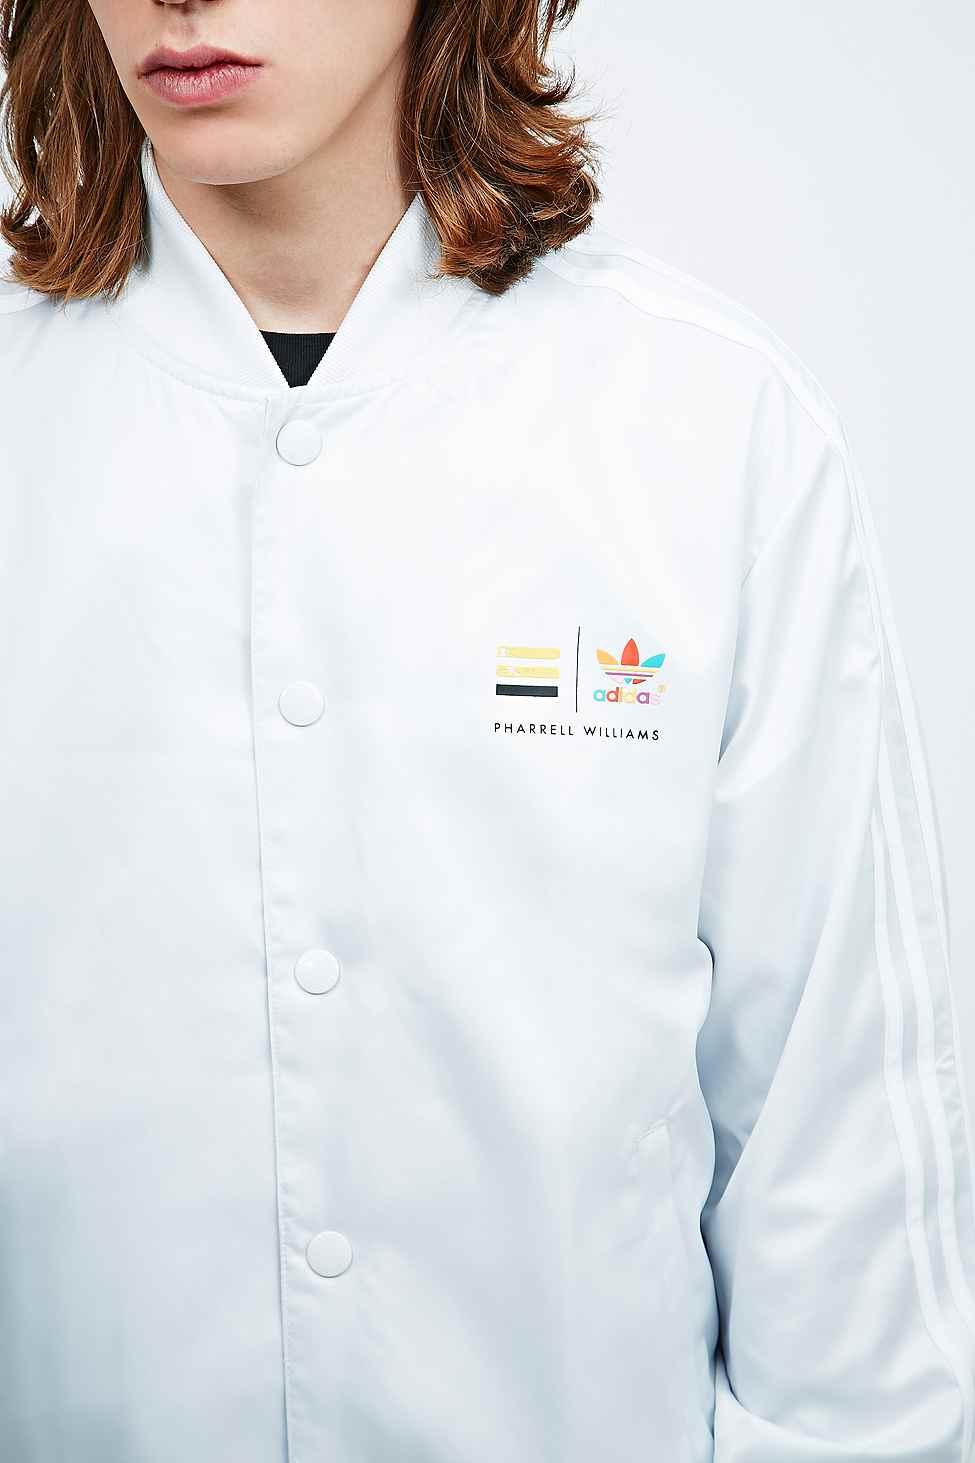 adidas Originals X Pharrell Williams Track Jacket in Neo White for Men